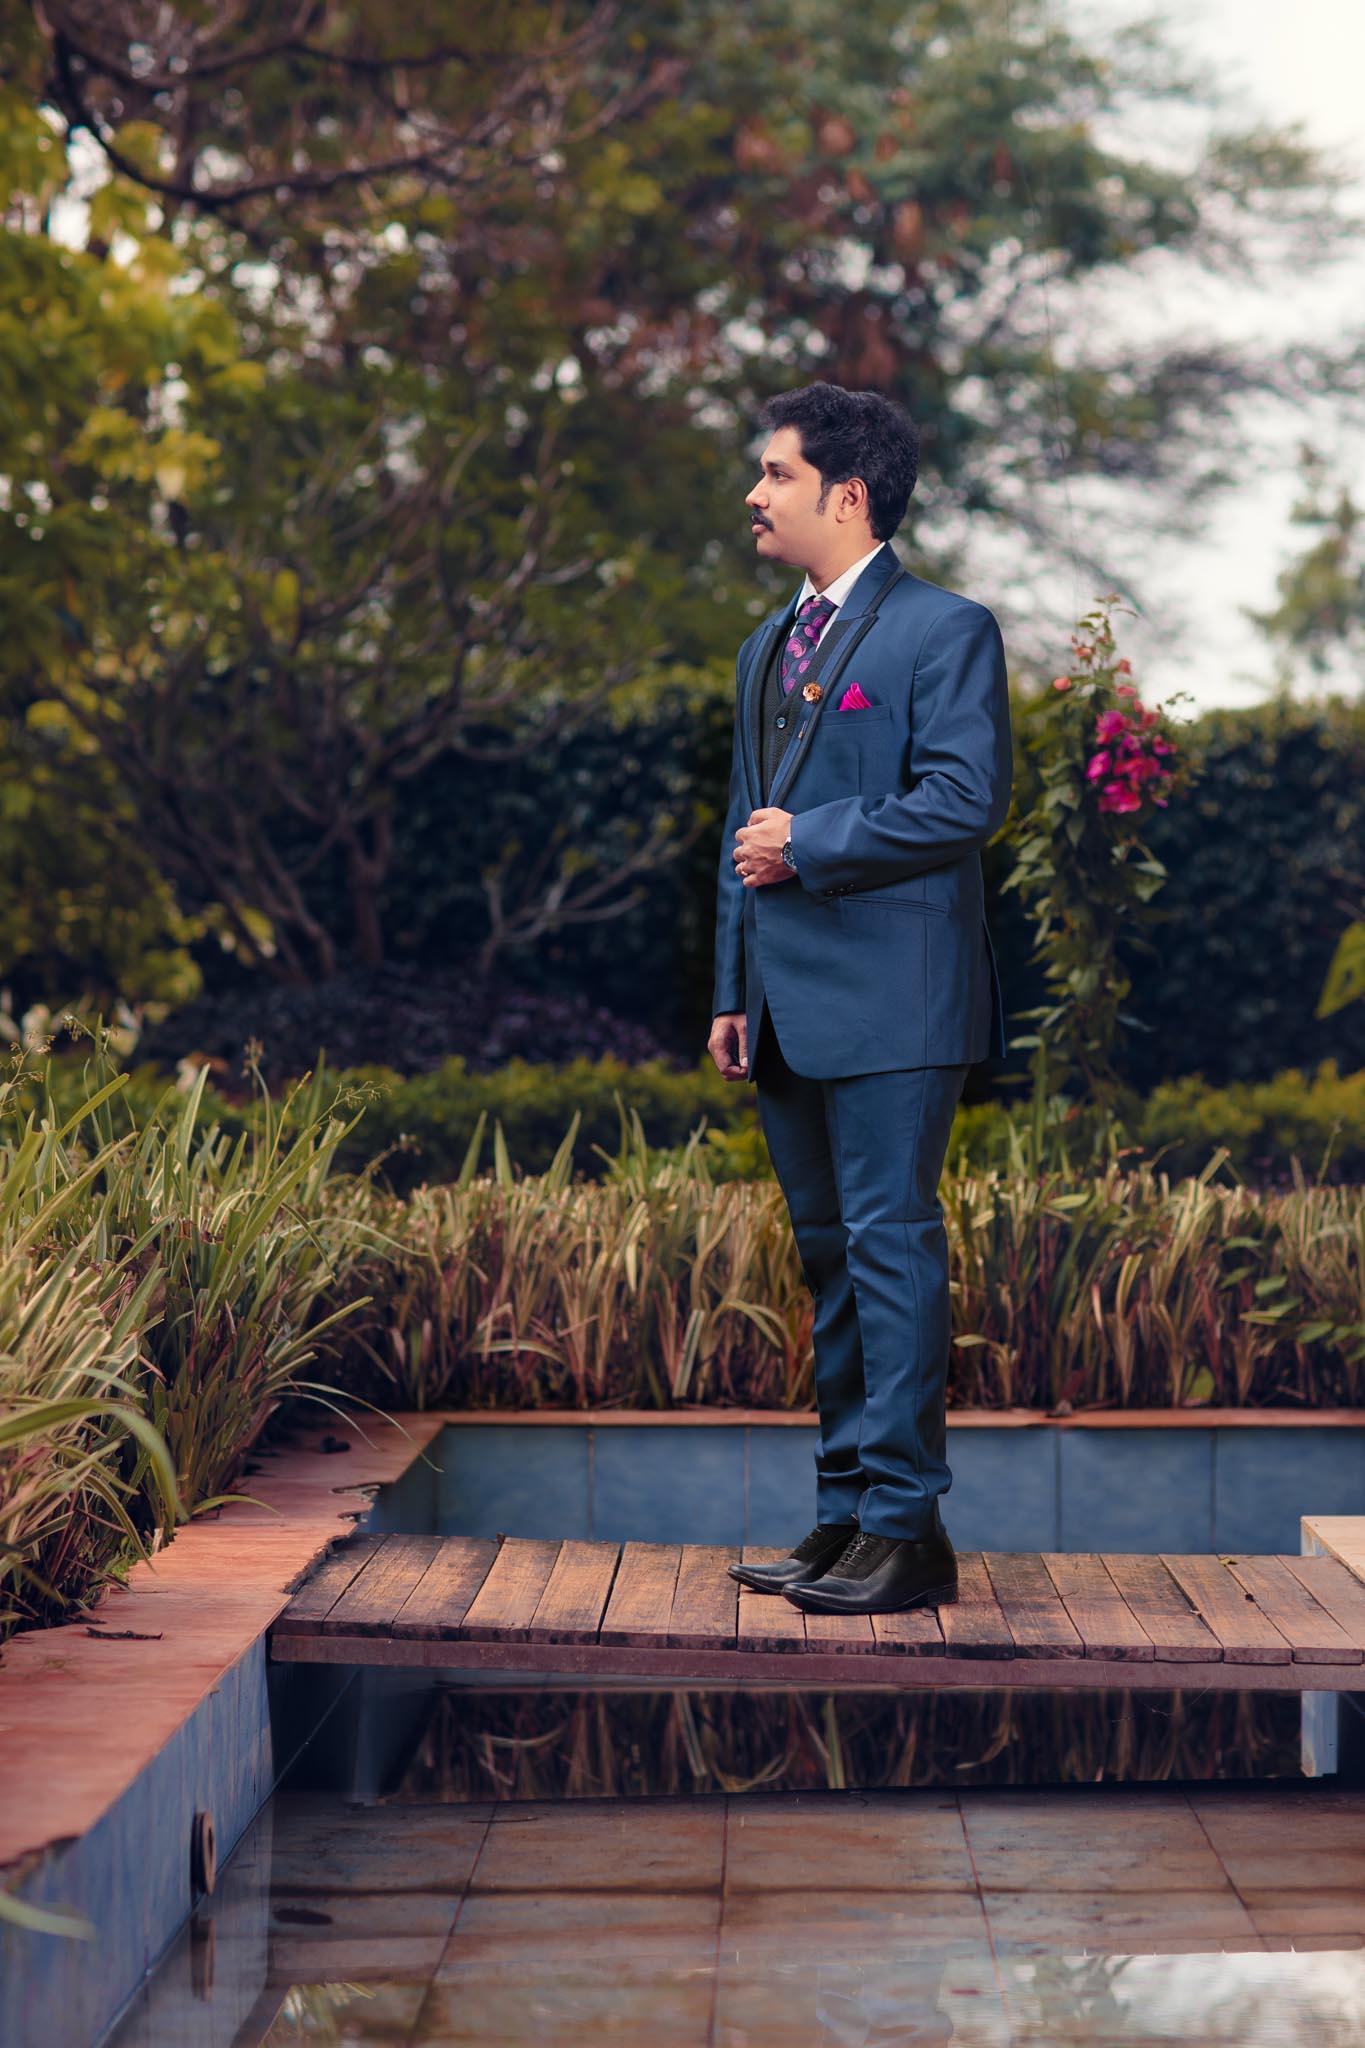 Best-of-2018-wedding-photography-focuz-studios-19